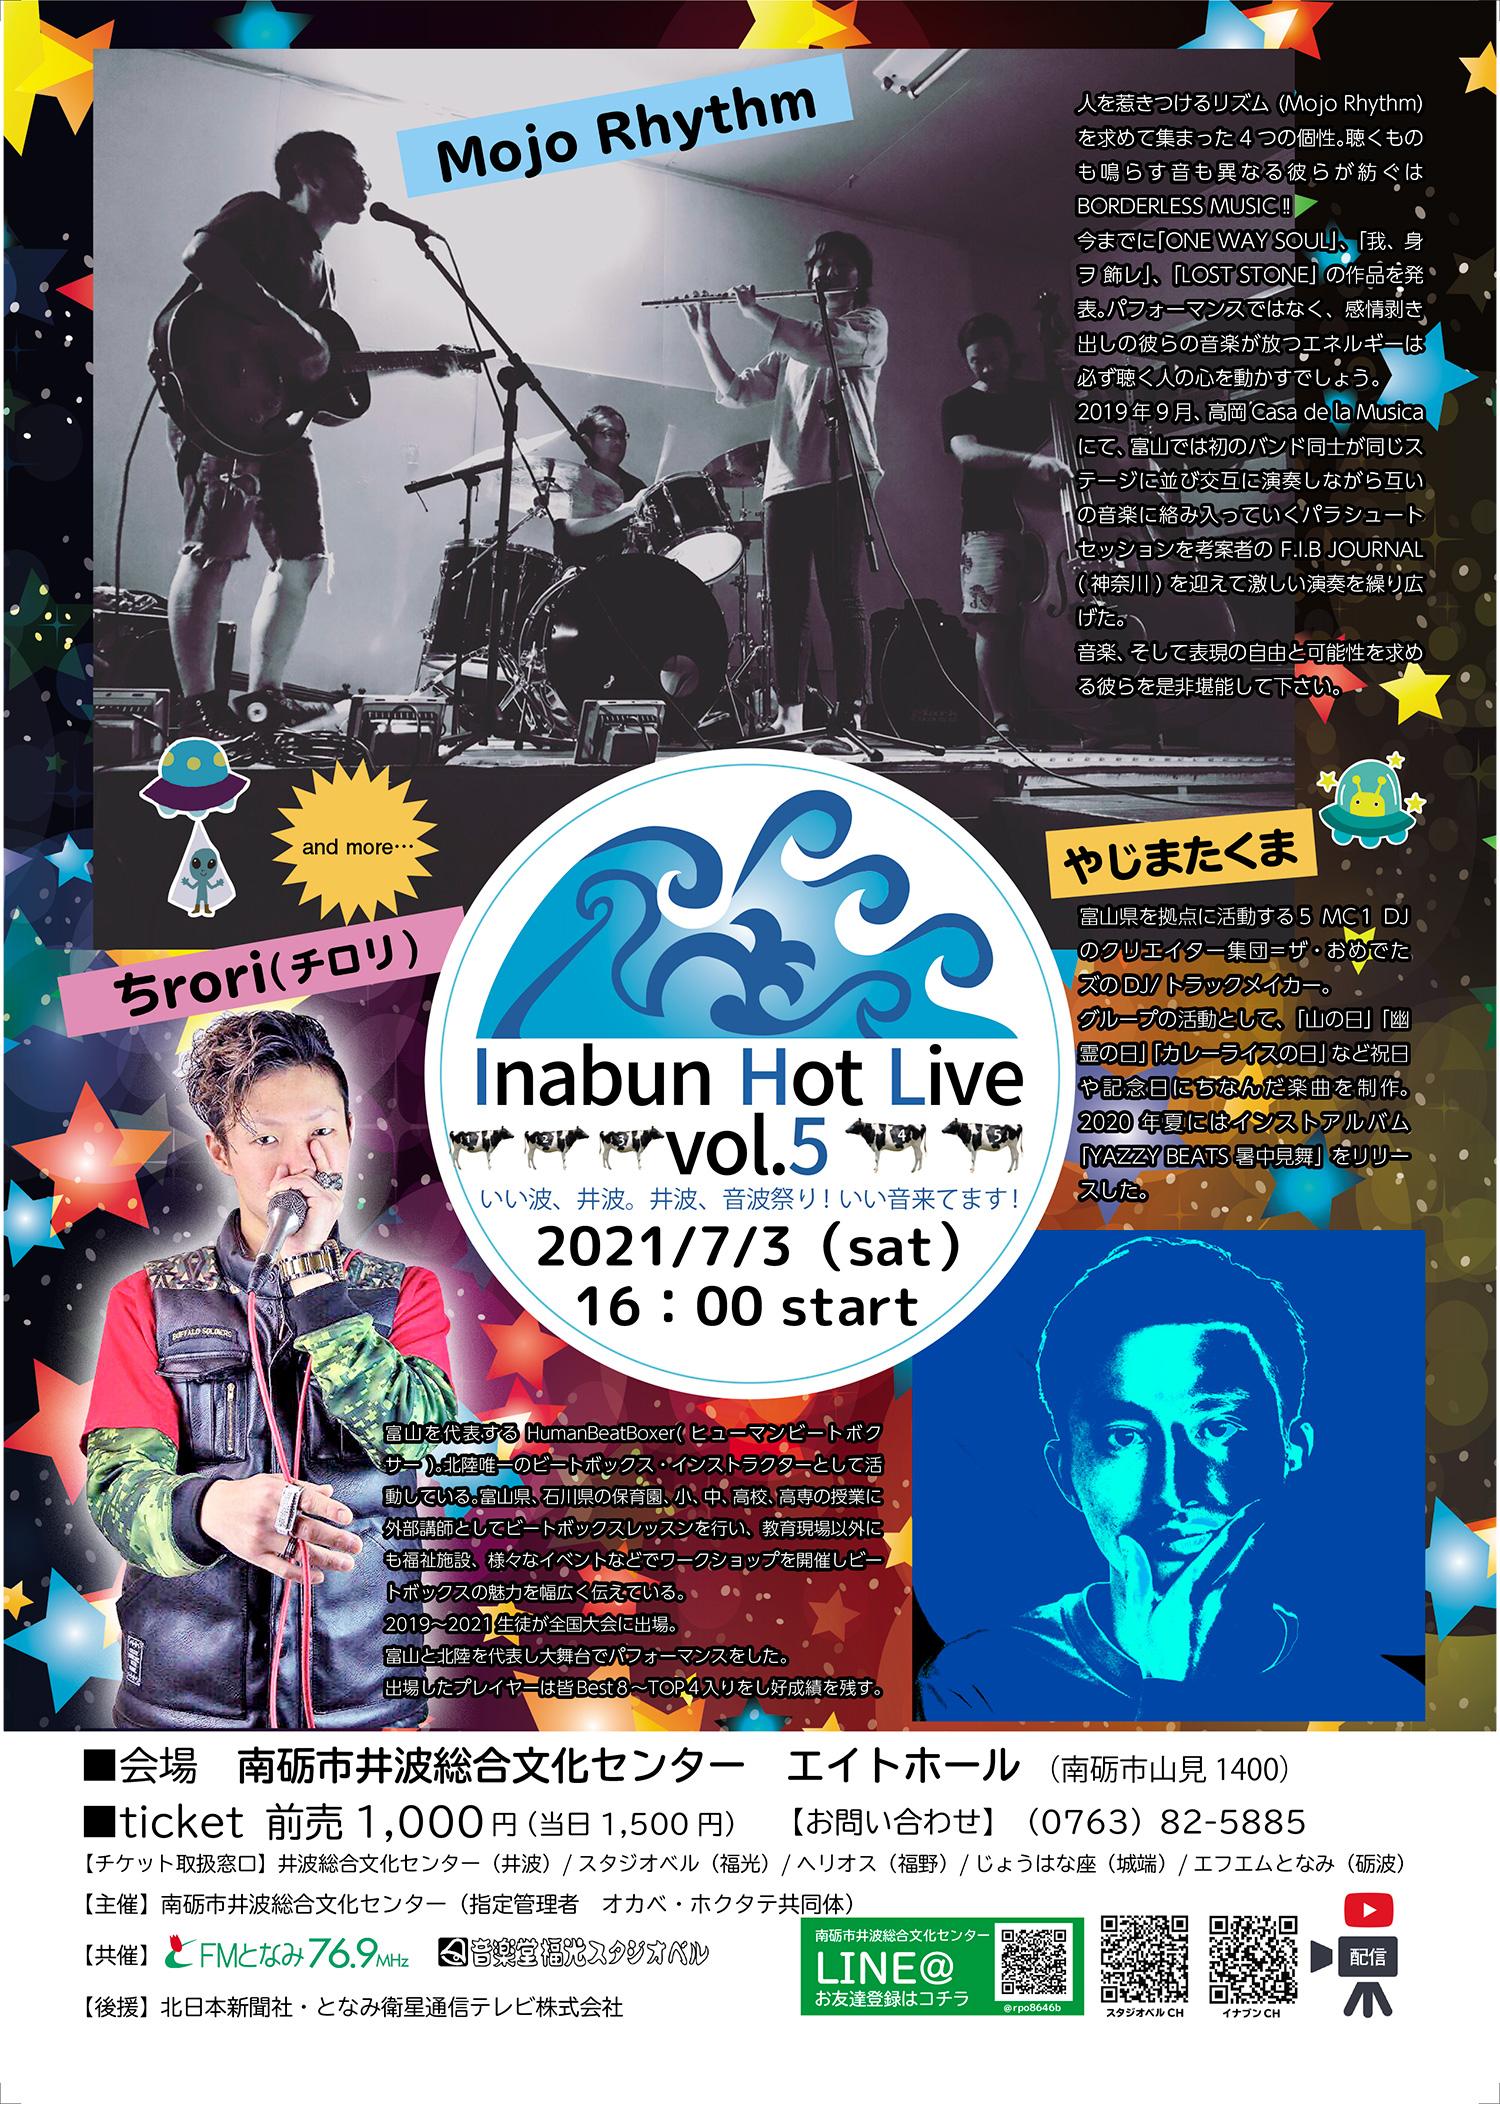 Inabun Hot Live Vol.5の画像